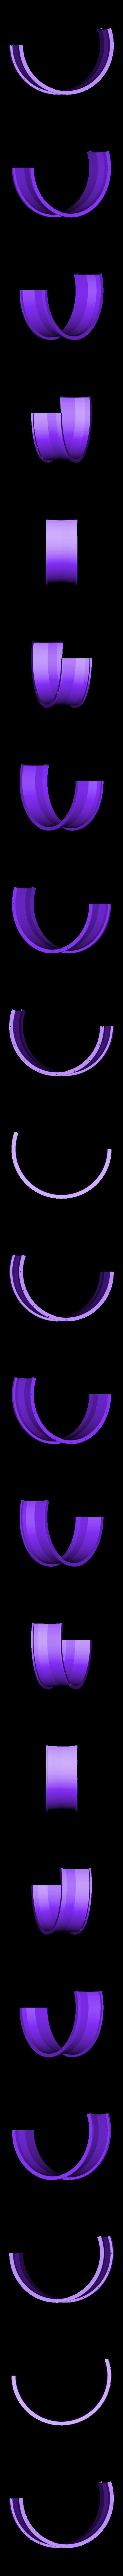 Fan-Duct01.stl Download free STL file Jet Engine, 3-Spool • 3D printable object, konchan77